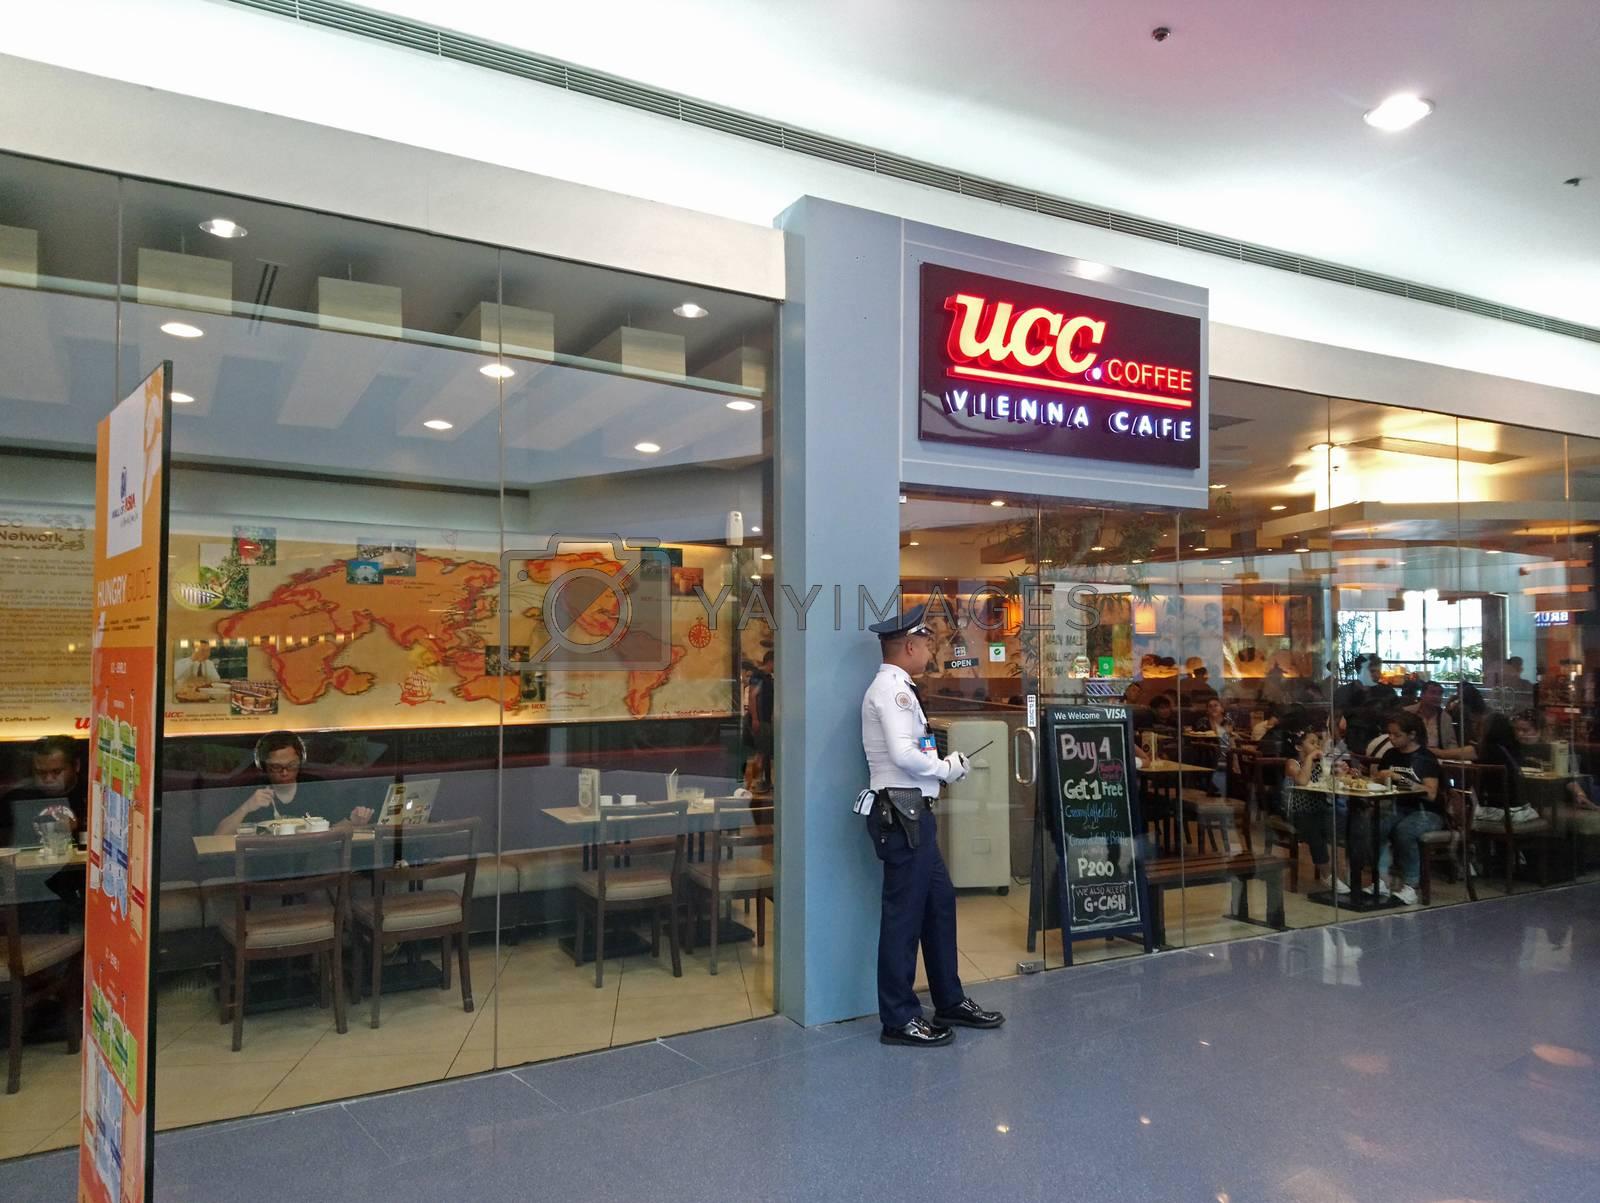 PASAY, PH - NOV 12 - UCC coffee Vienna cafe facade on November 12, 2018 in Pasay, Philippines.